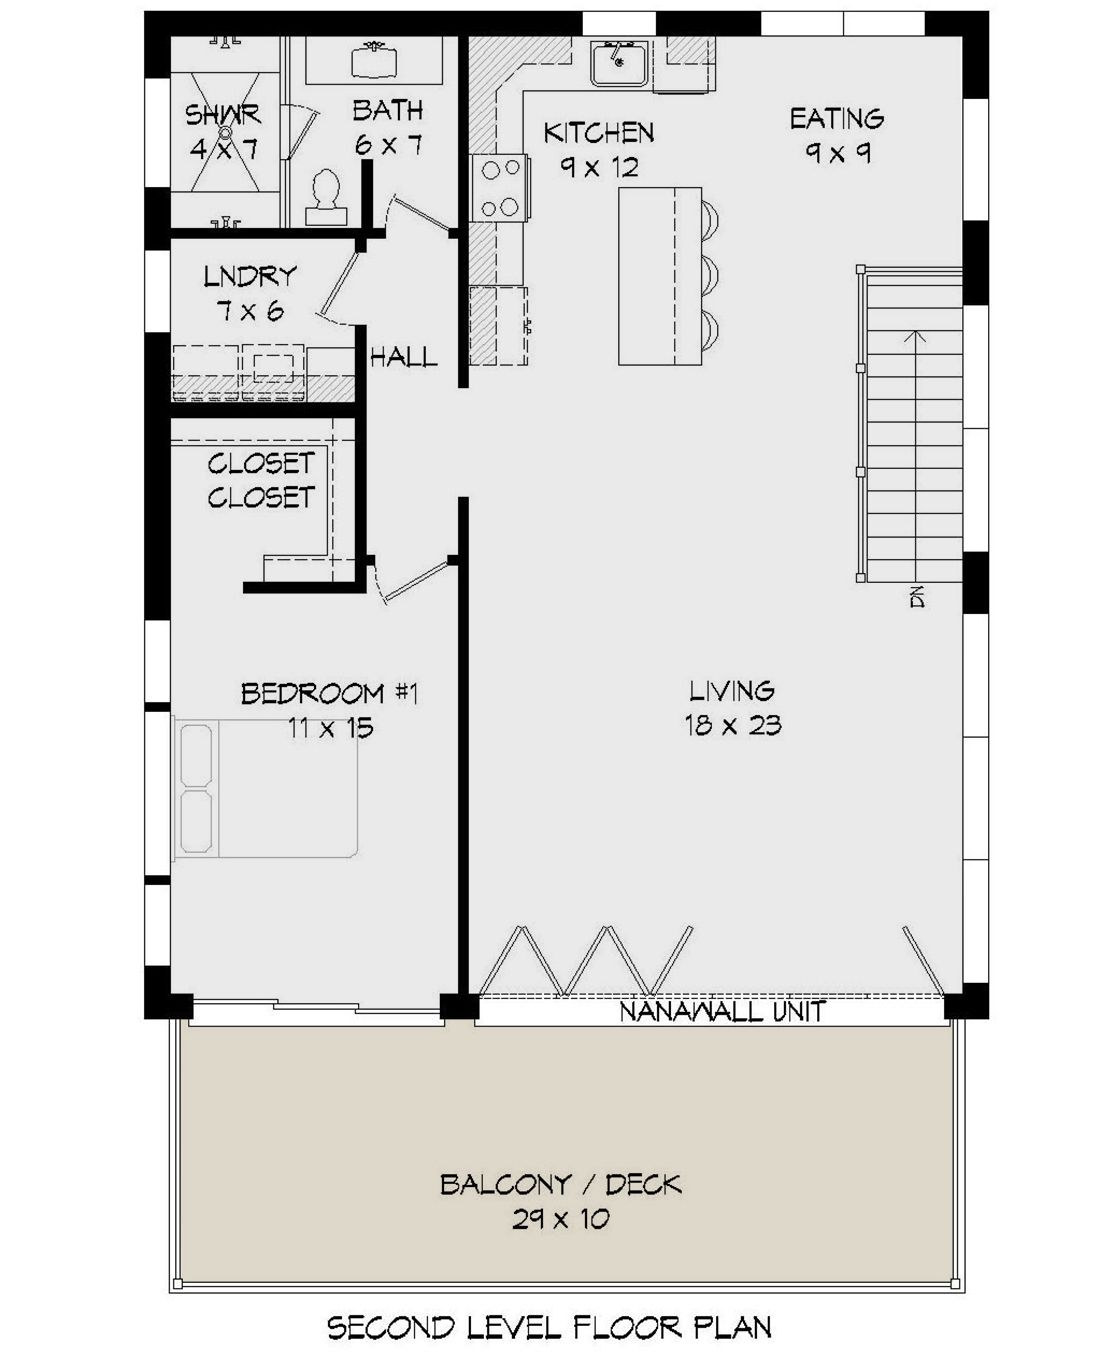 House Plan 940 00183 Modern Plan 1 309 Square Feet 1 Bedroom 1 5 Bathrooms Garage Apartment Floor Plans House Plans Carriage House Plans